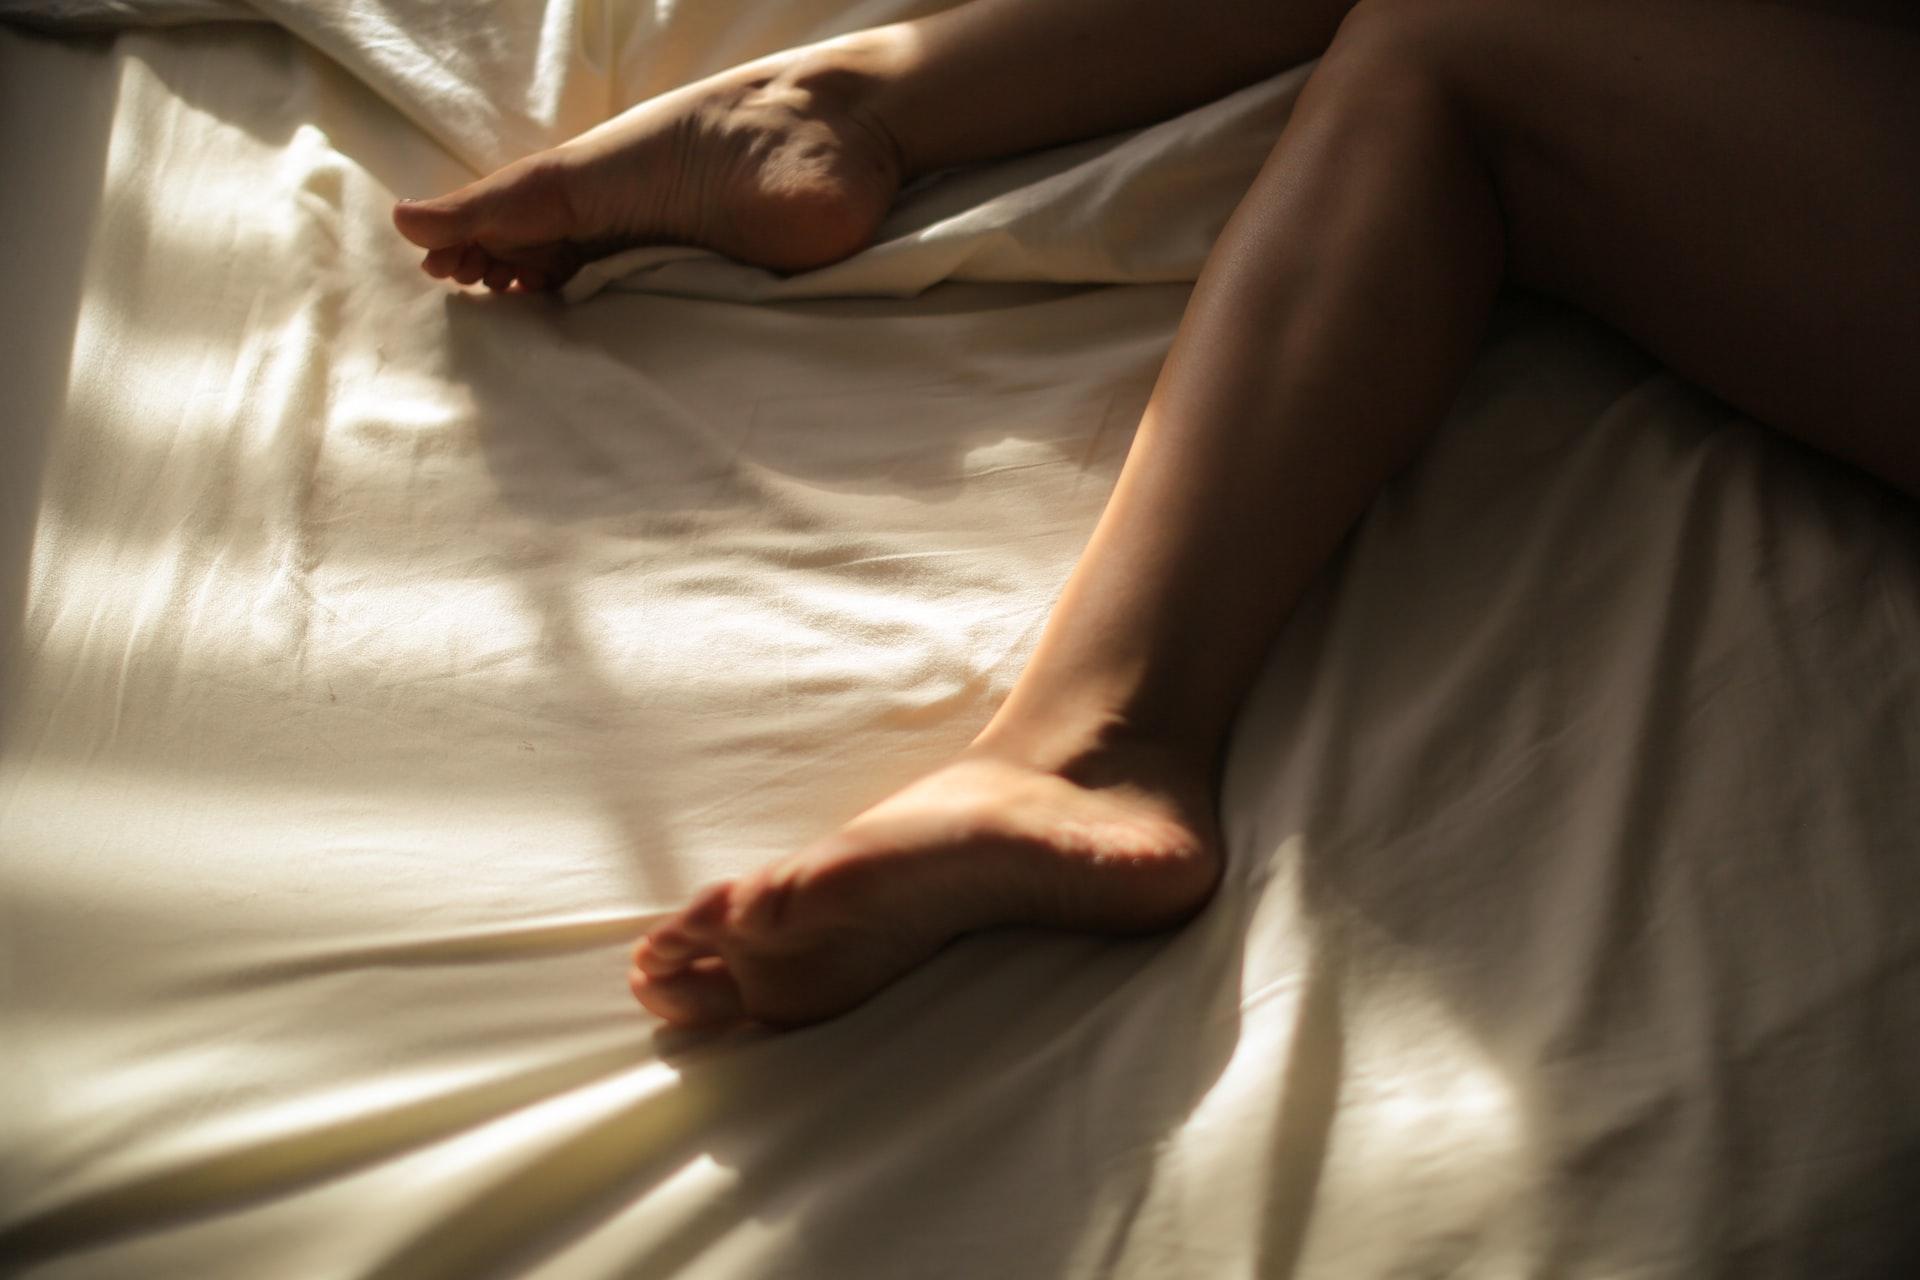 jambe femme lit